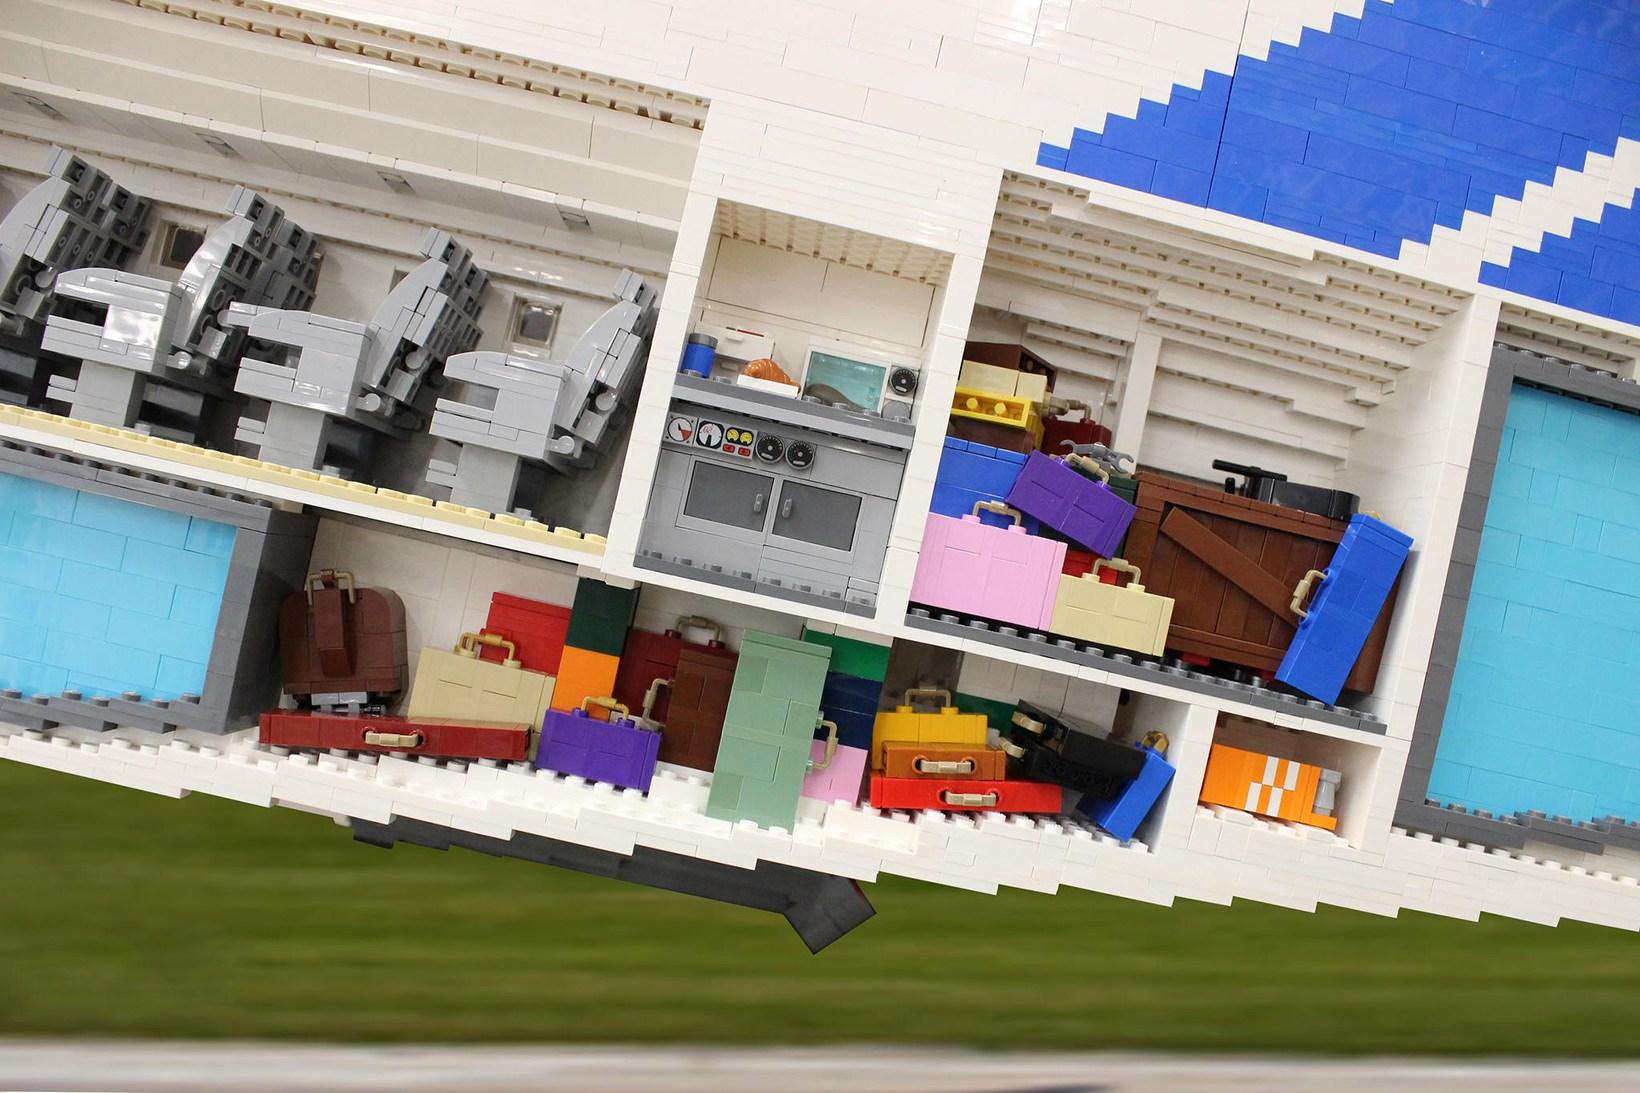 LEGO-concorde-plane-3